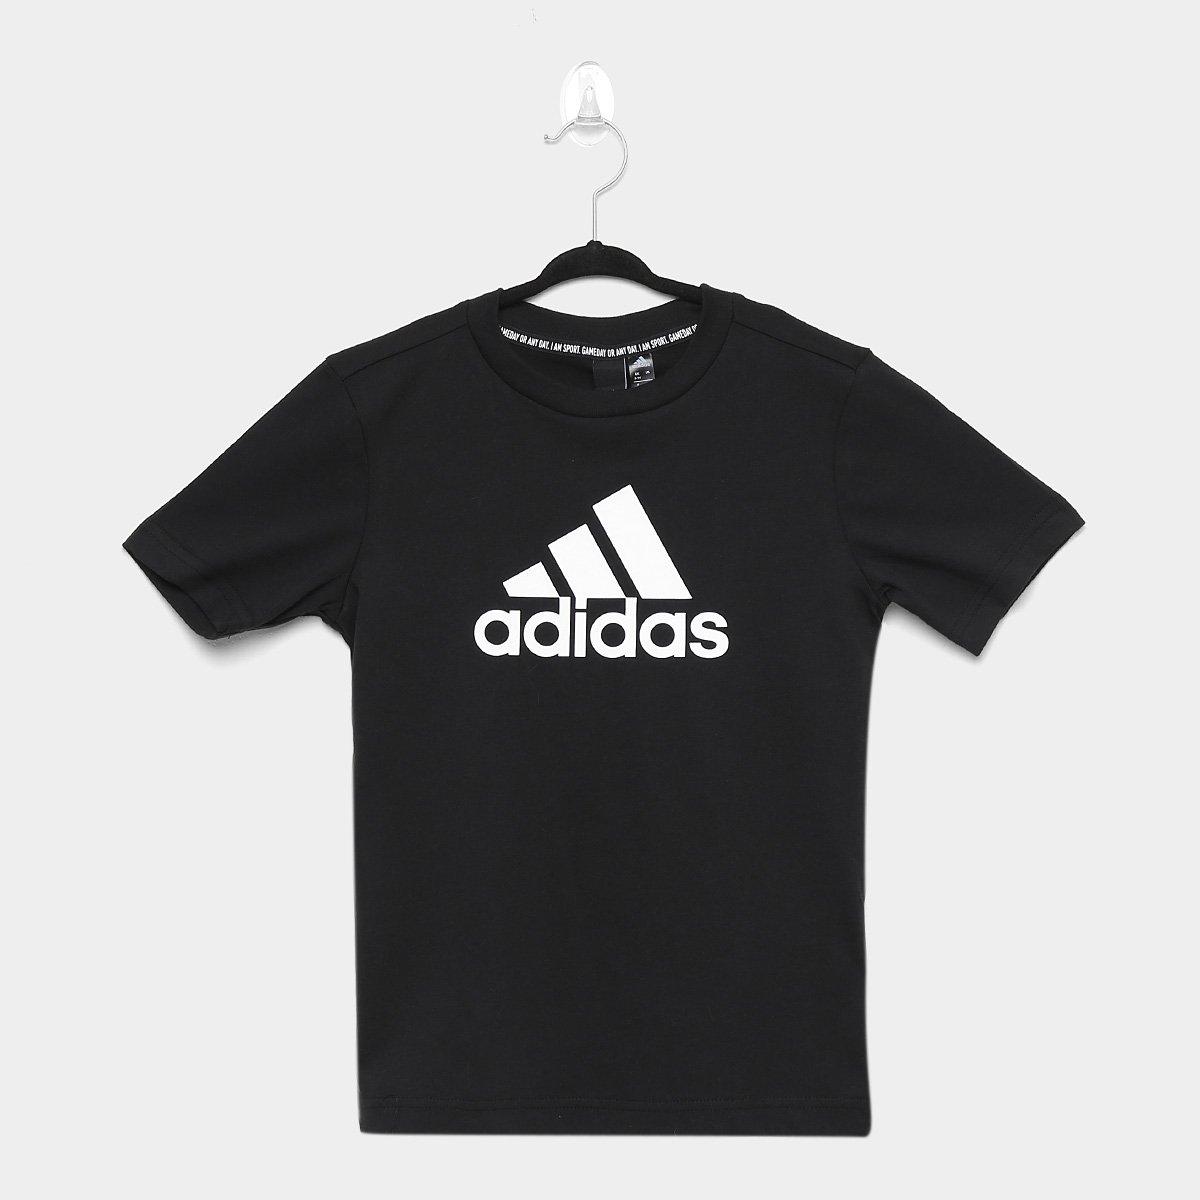 Camiseta Infantil Adidas Mh Bos Yb Manga Curta Masculina - Tam: 12-13A